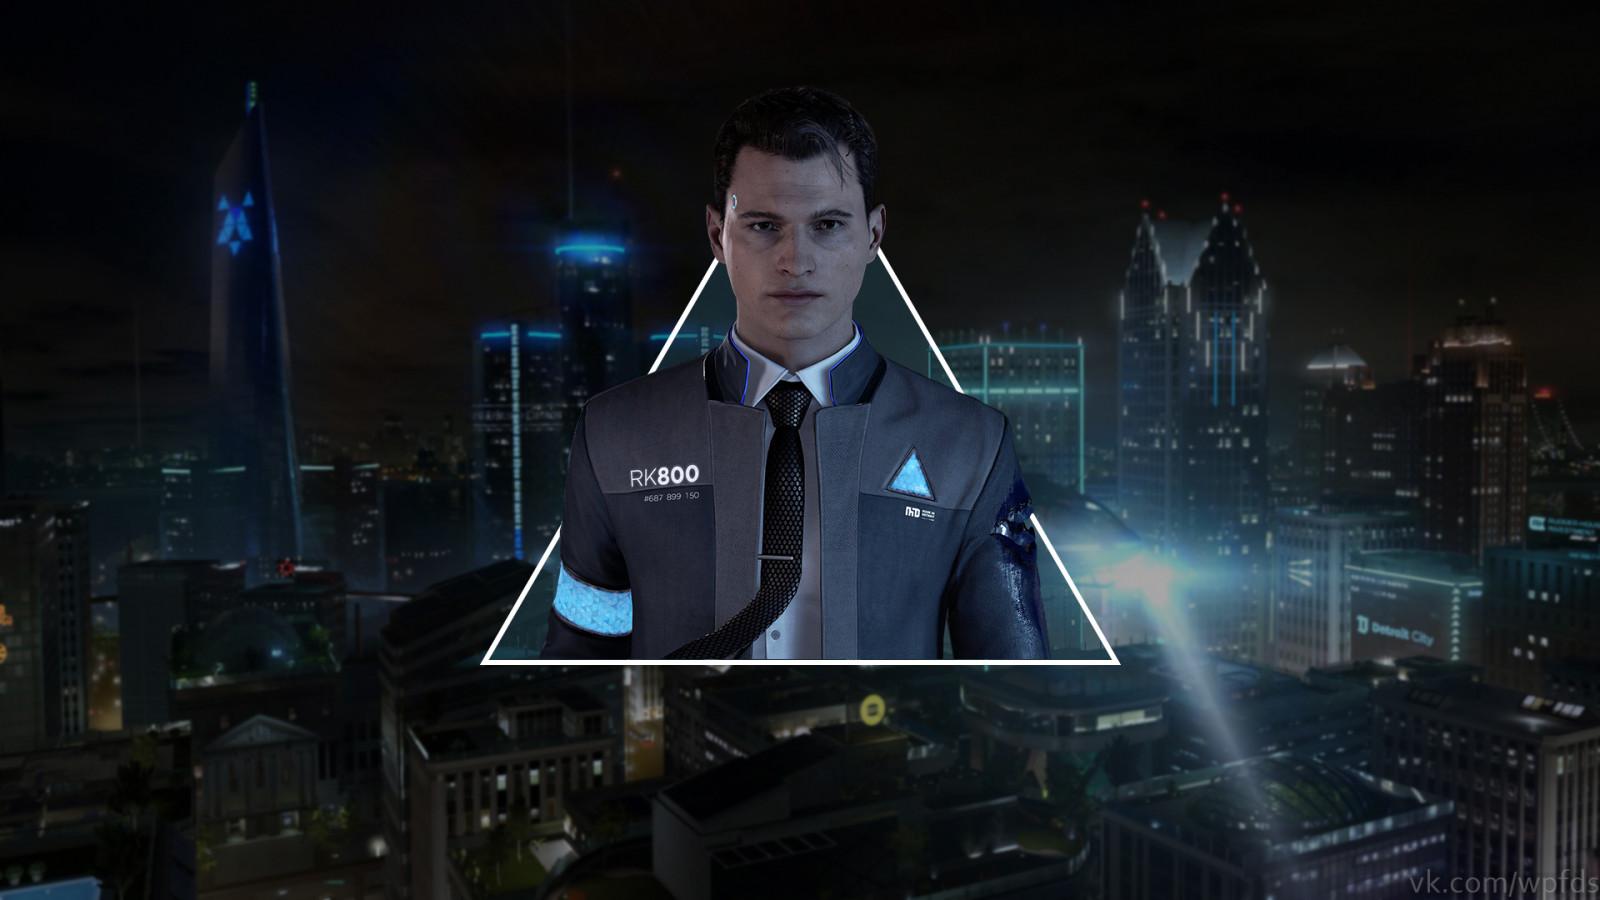 Detroit Become Human Hd Wallpaper: Wallpaper : Detroit Become Human, Connor, Video Games